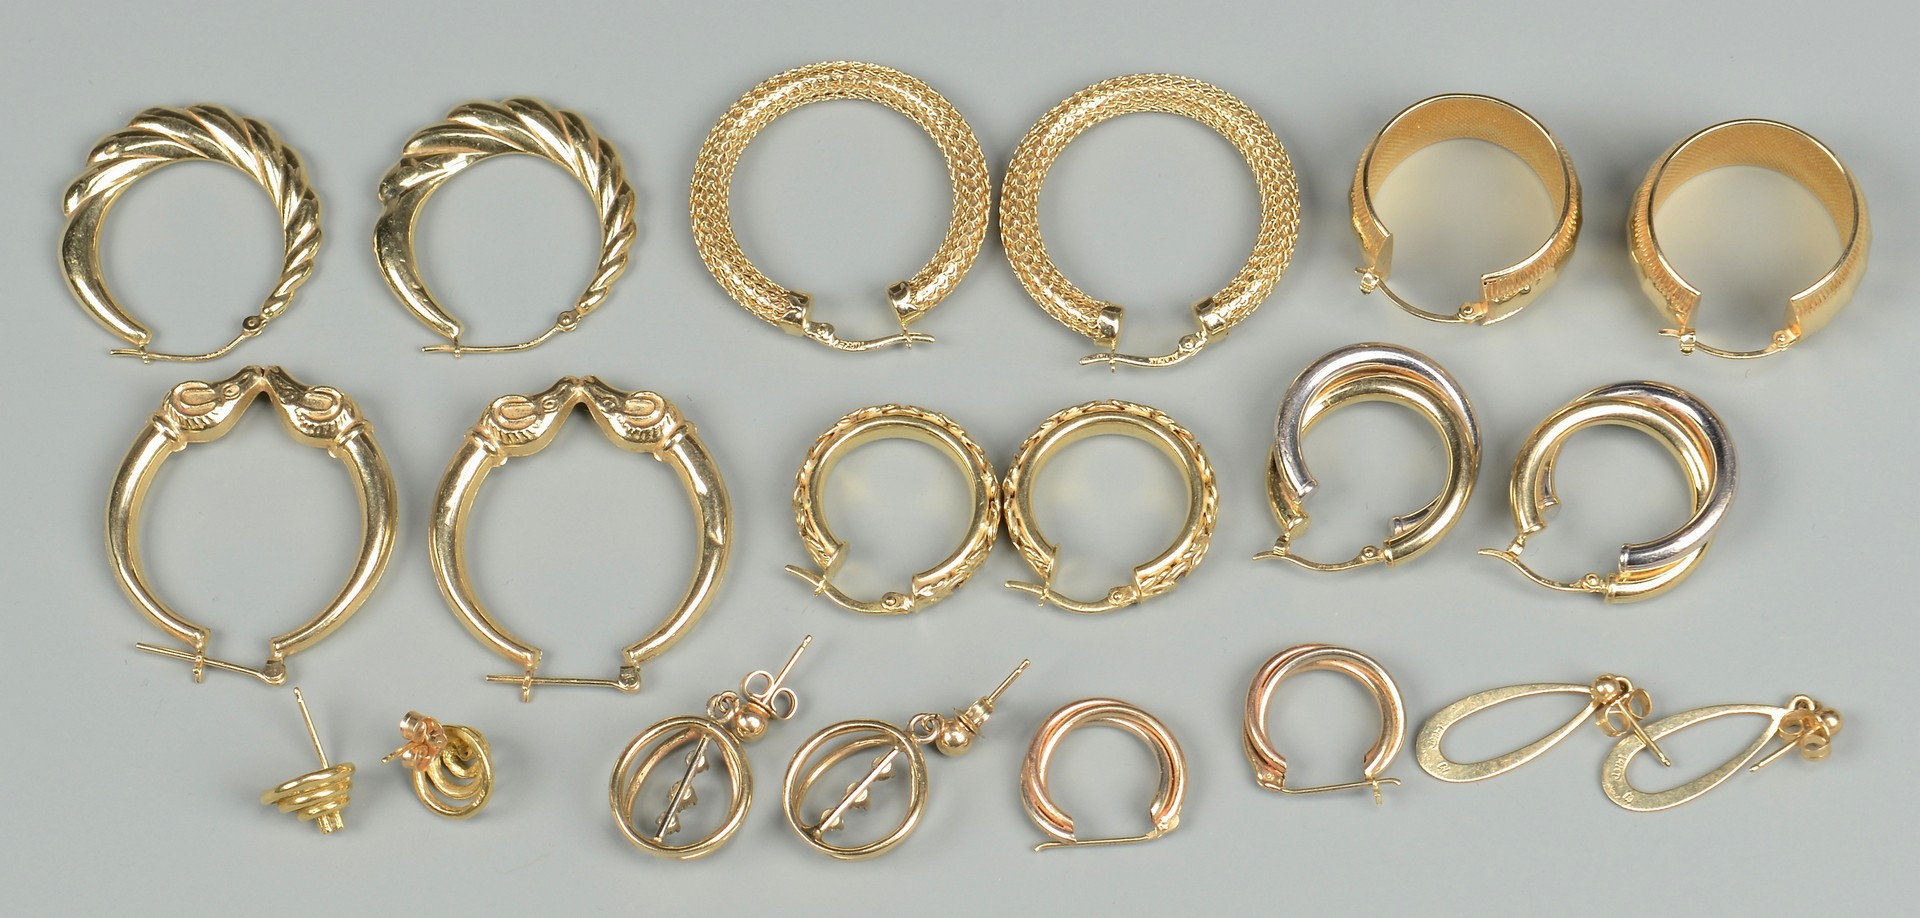 Lot 402: 10 pr 14k and 18k Earrings